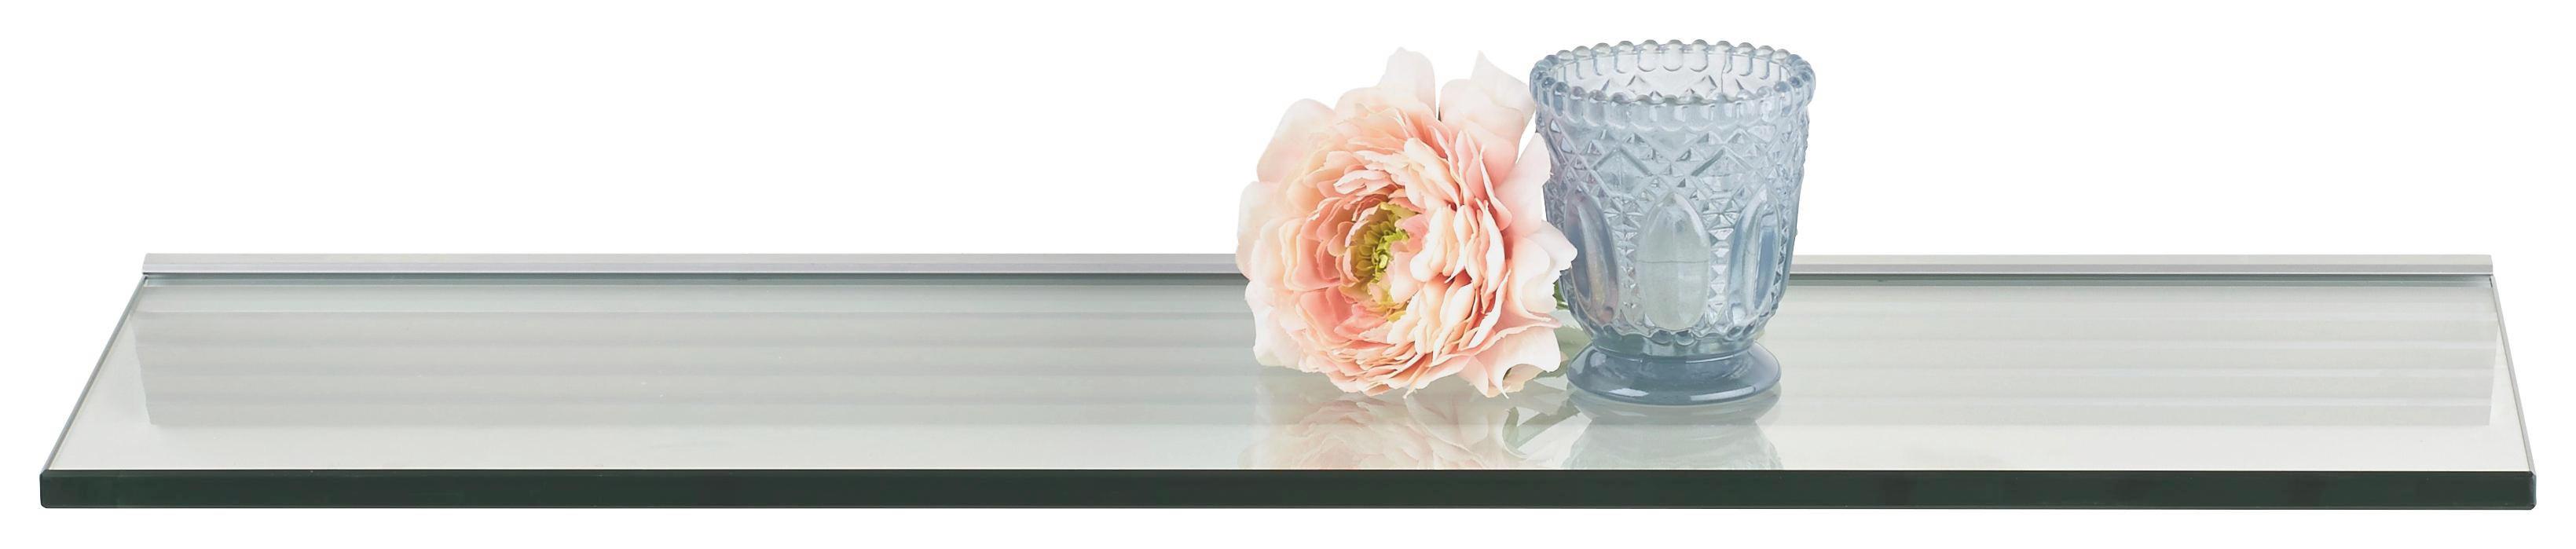 WANDBOARD Transparent - Transparent, Glas (60/20cm)